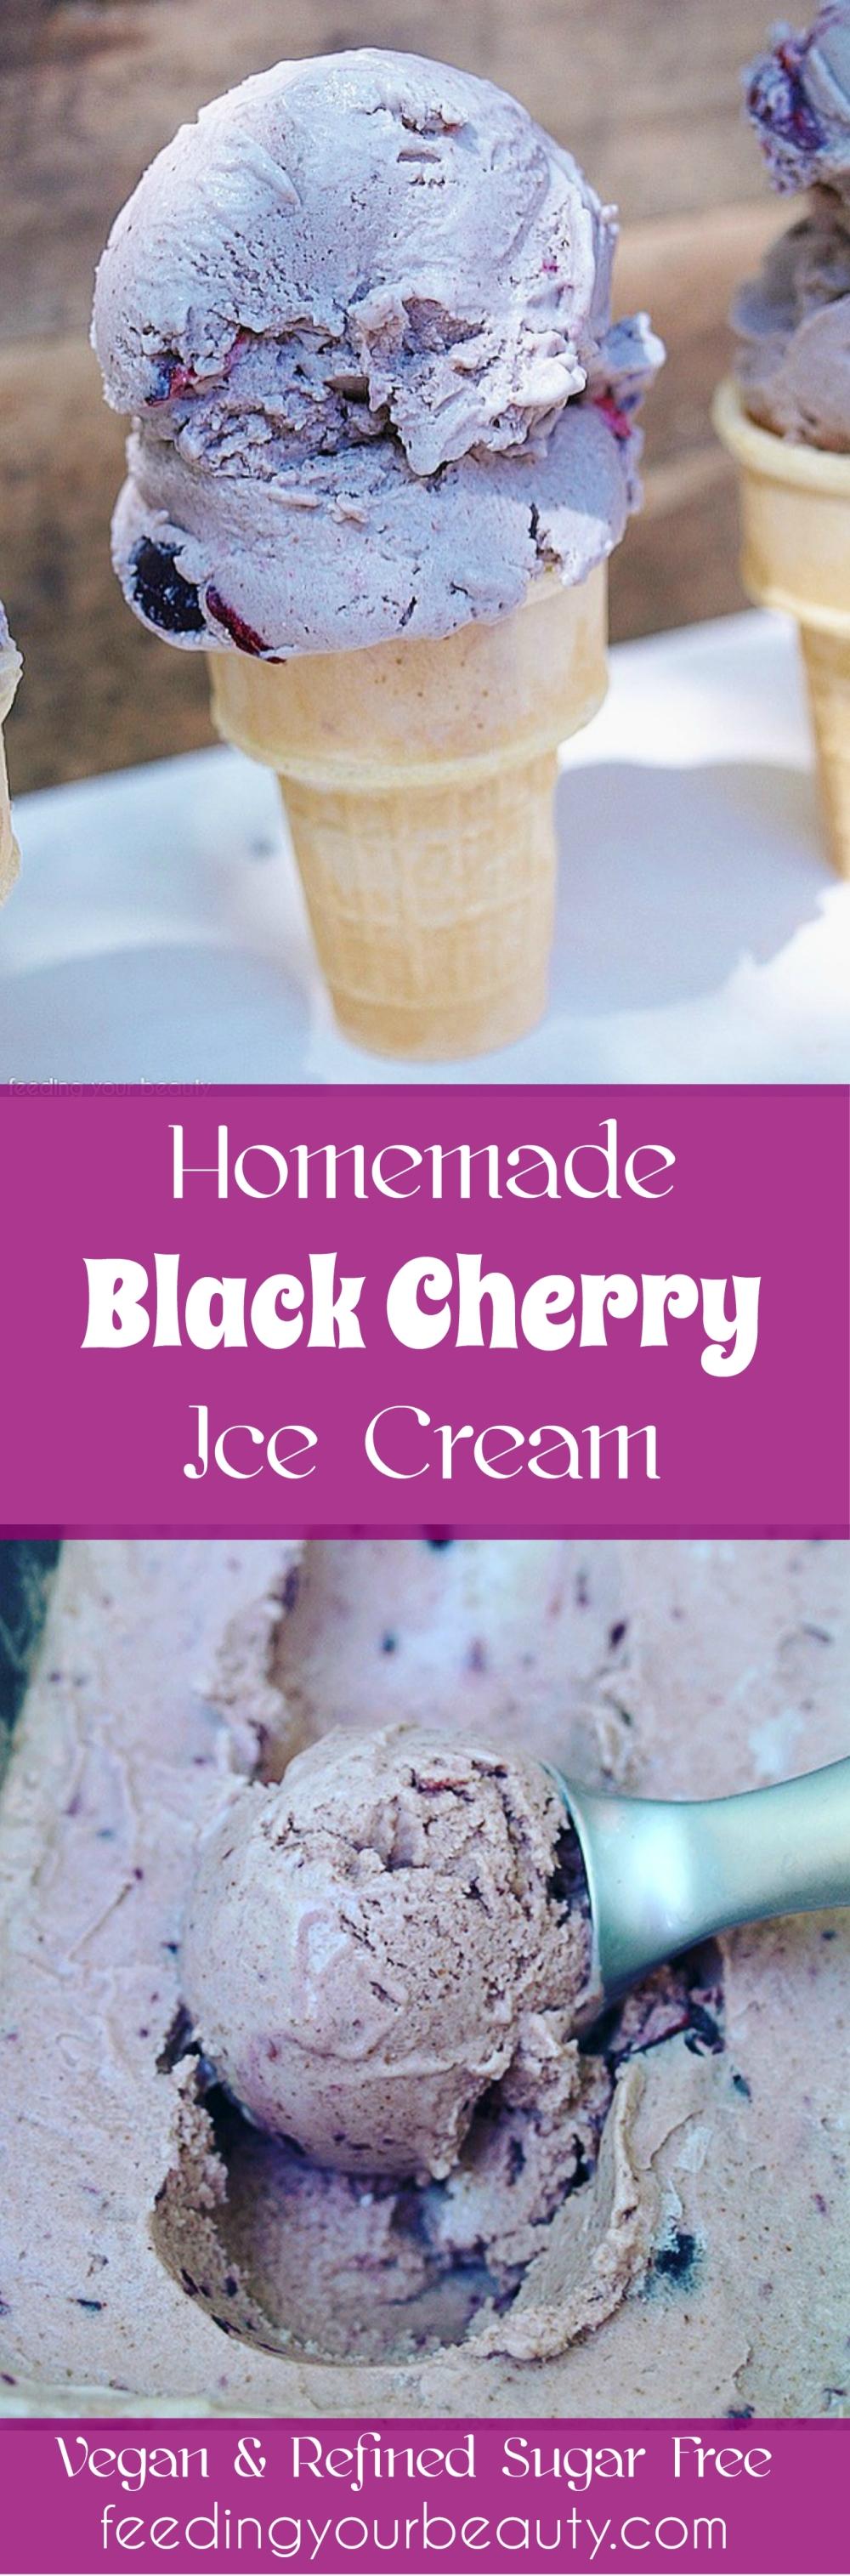 Black Cherry Ice Cream - Vegan, Refined Sugar Free, Naturally Flavored, Paleo